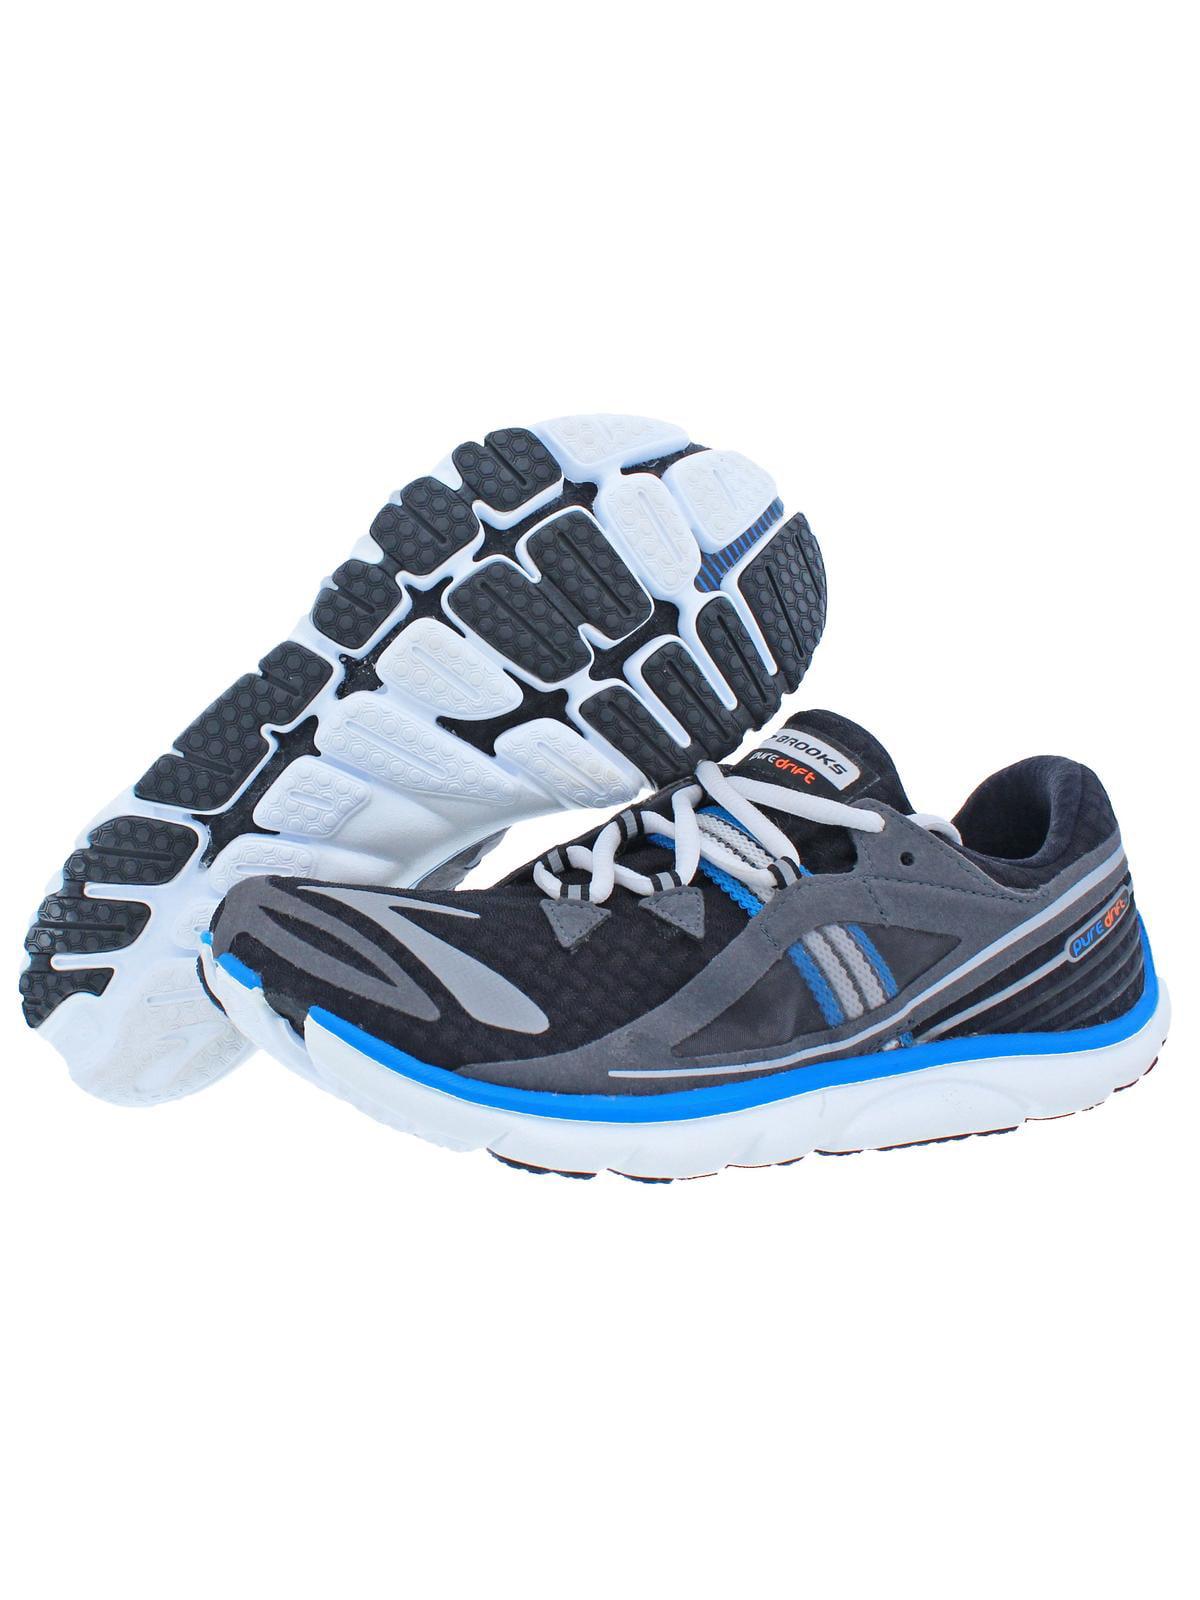 Brooks Mens Puredrift Athletic Running Running Shoes Black 7.5 Medium (D)